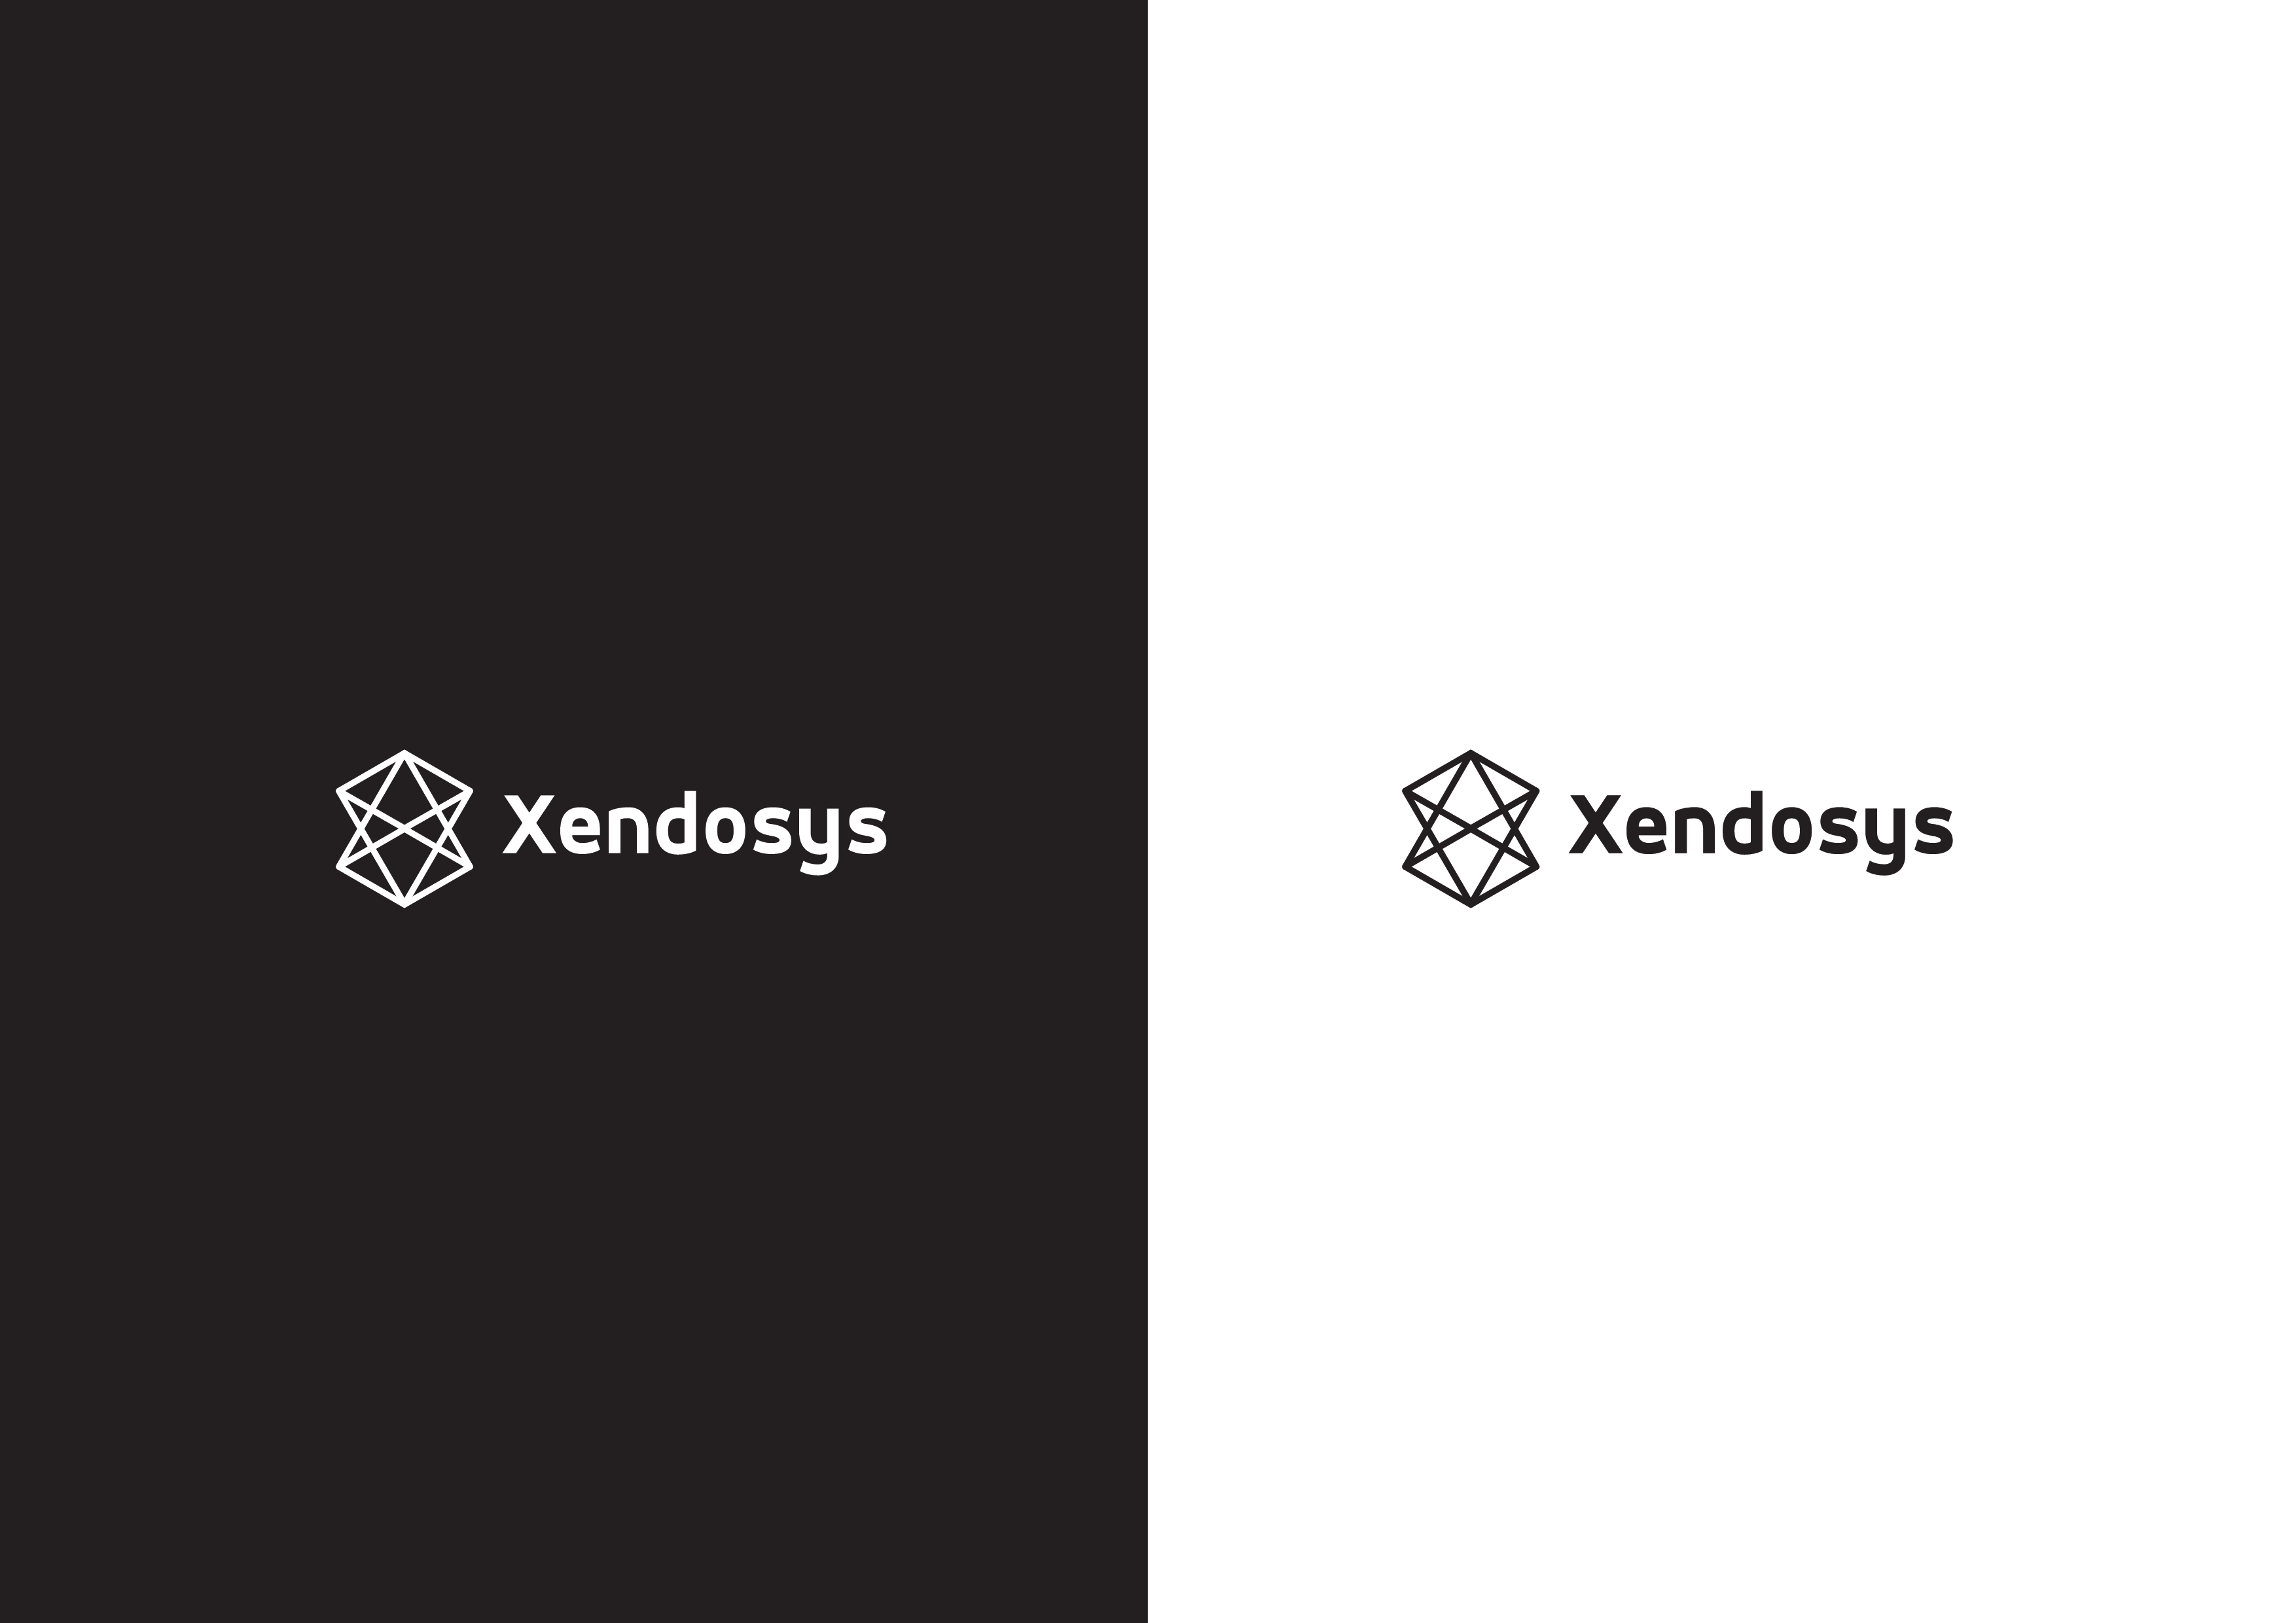 Xendosys needs a powerful new logo.